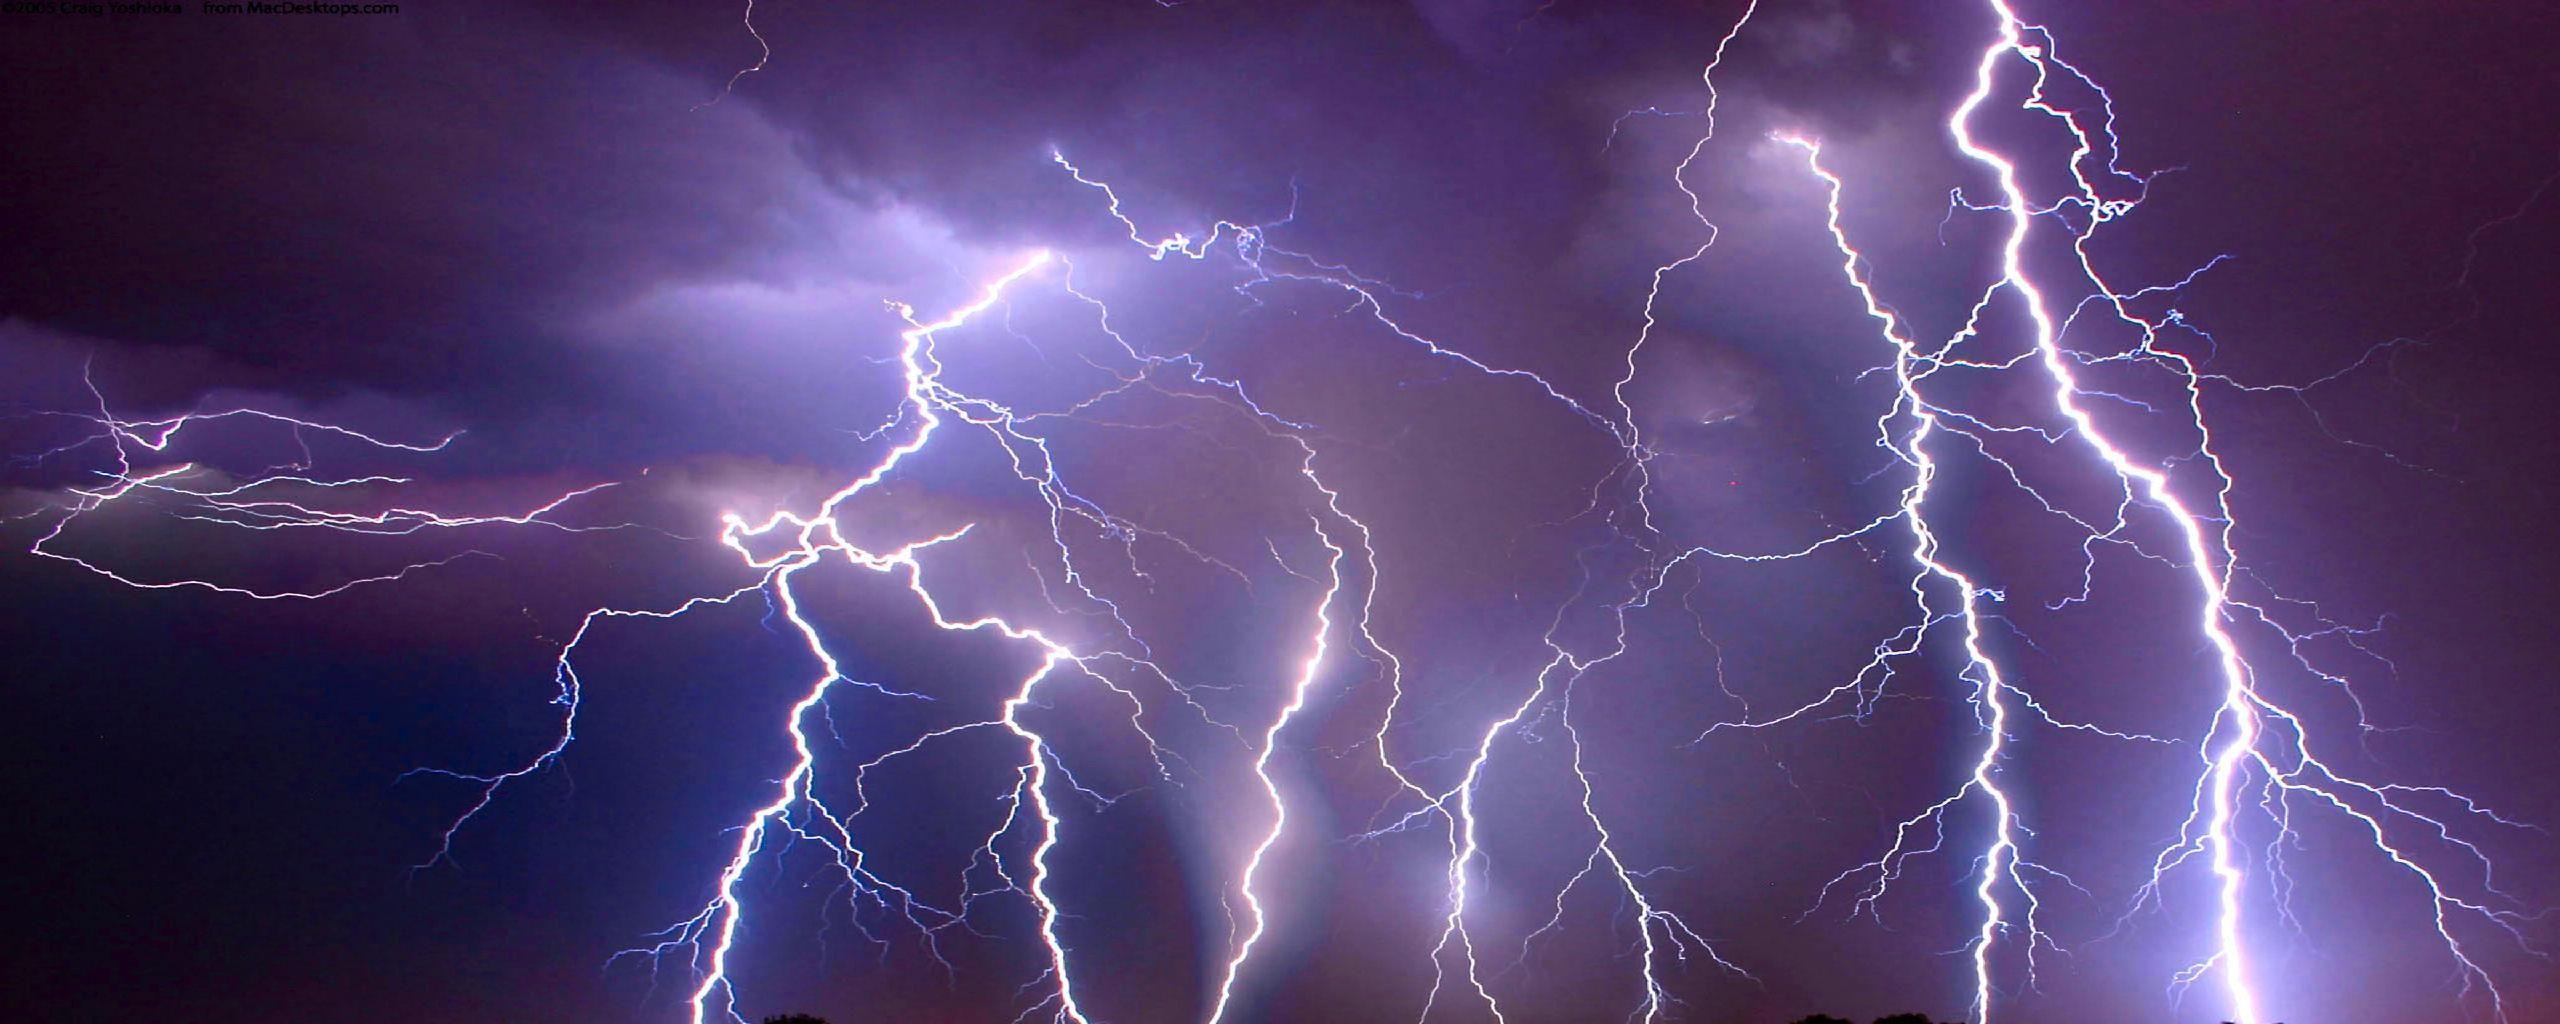 HD Lightning Wallpapers Wallpaper Iphone